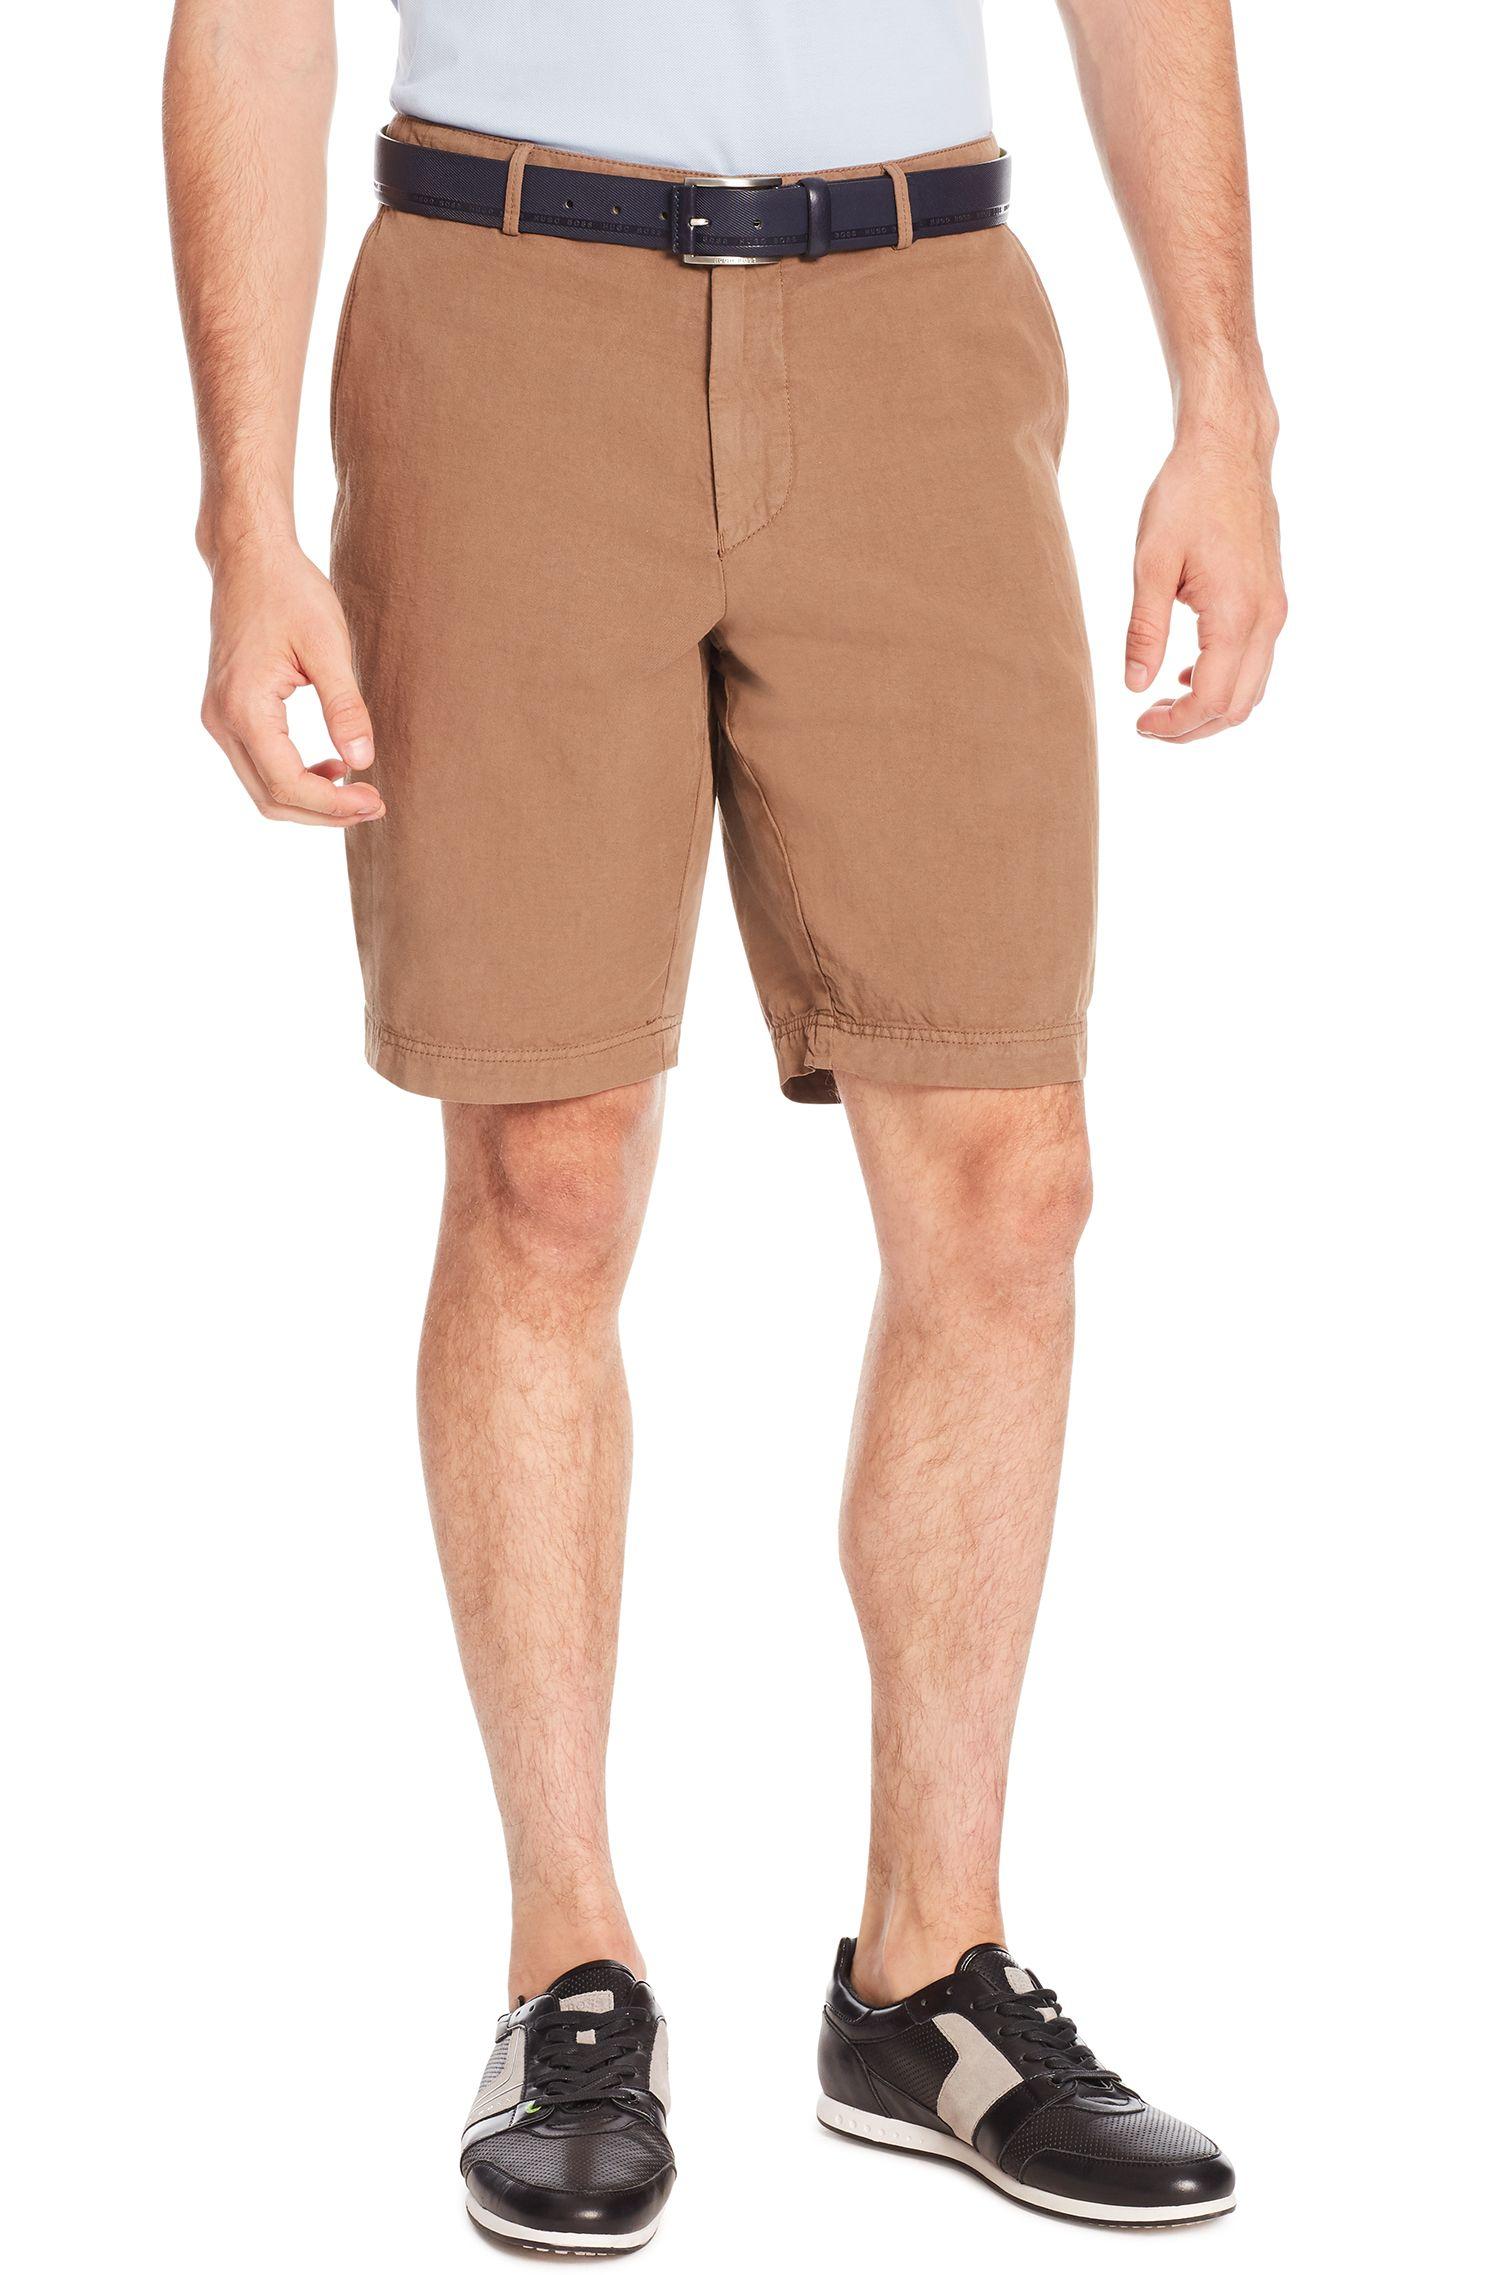 Cotton Linen Shorts, Regular Fit | Crigan Short D